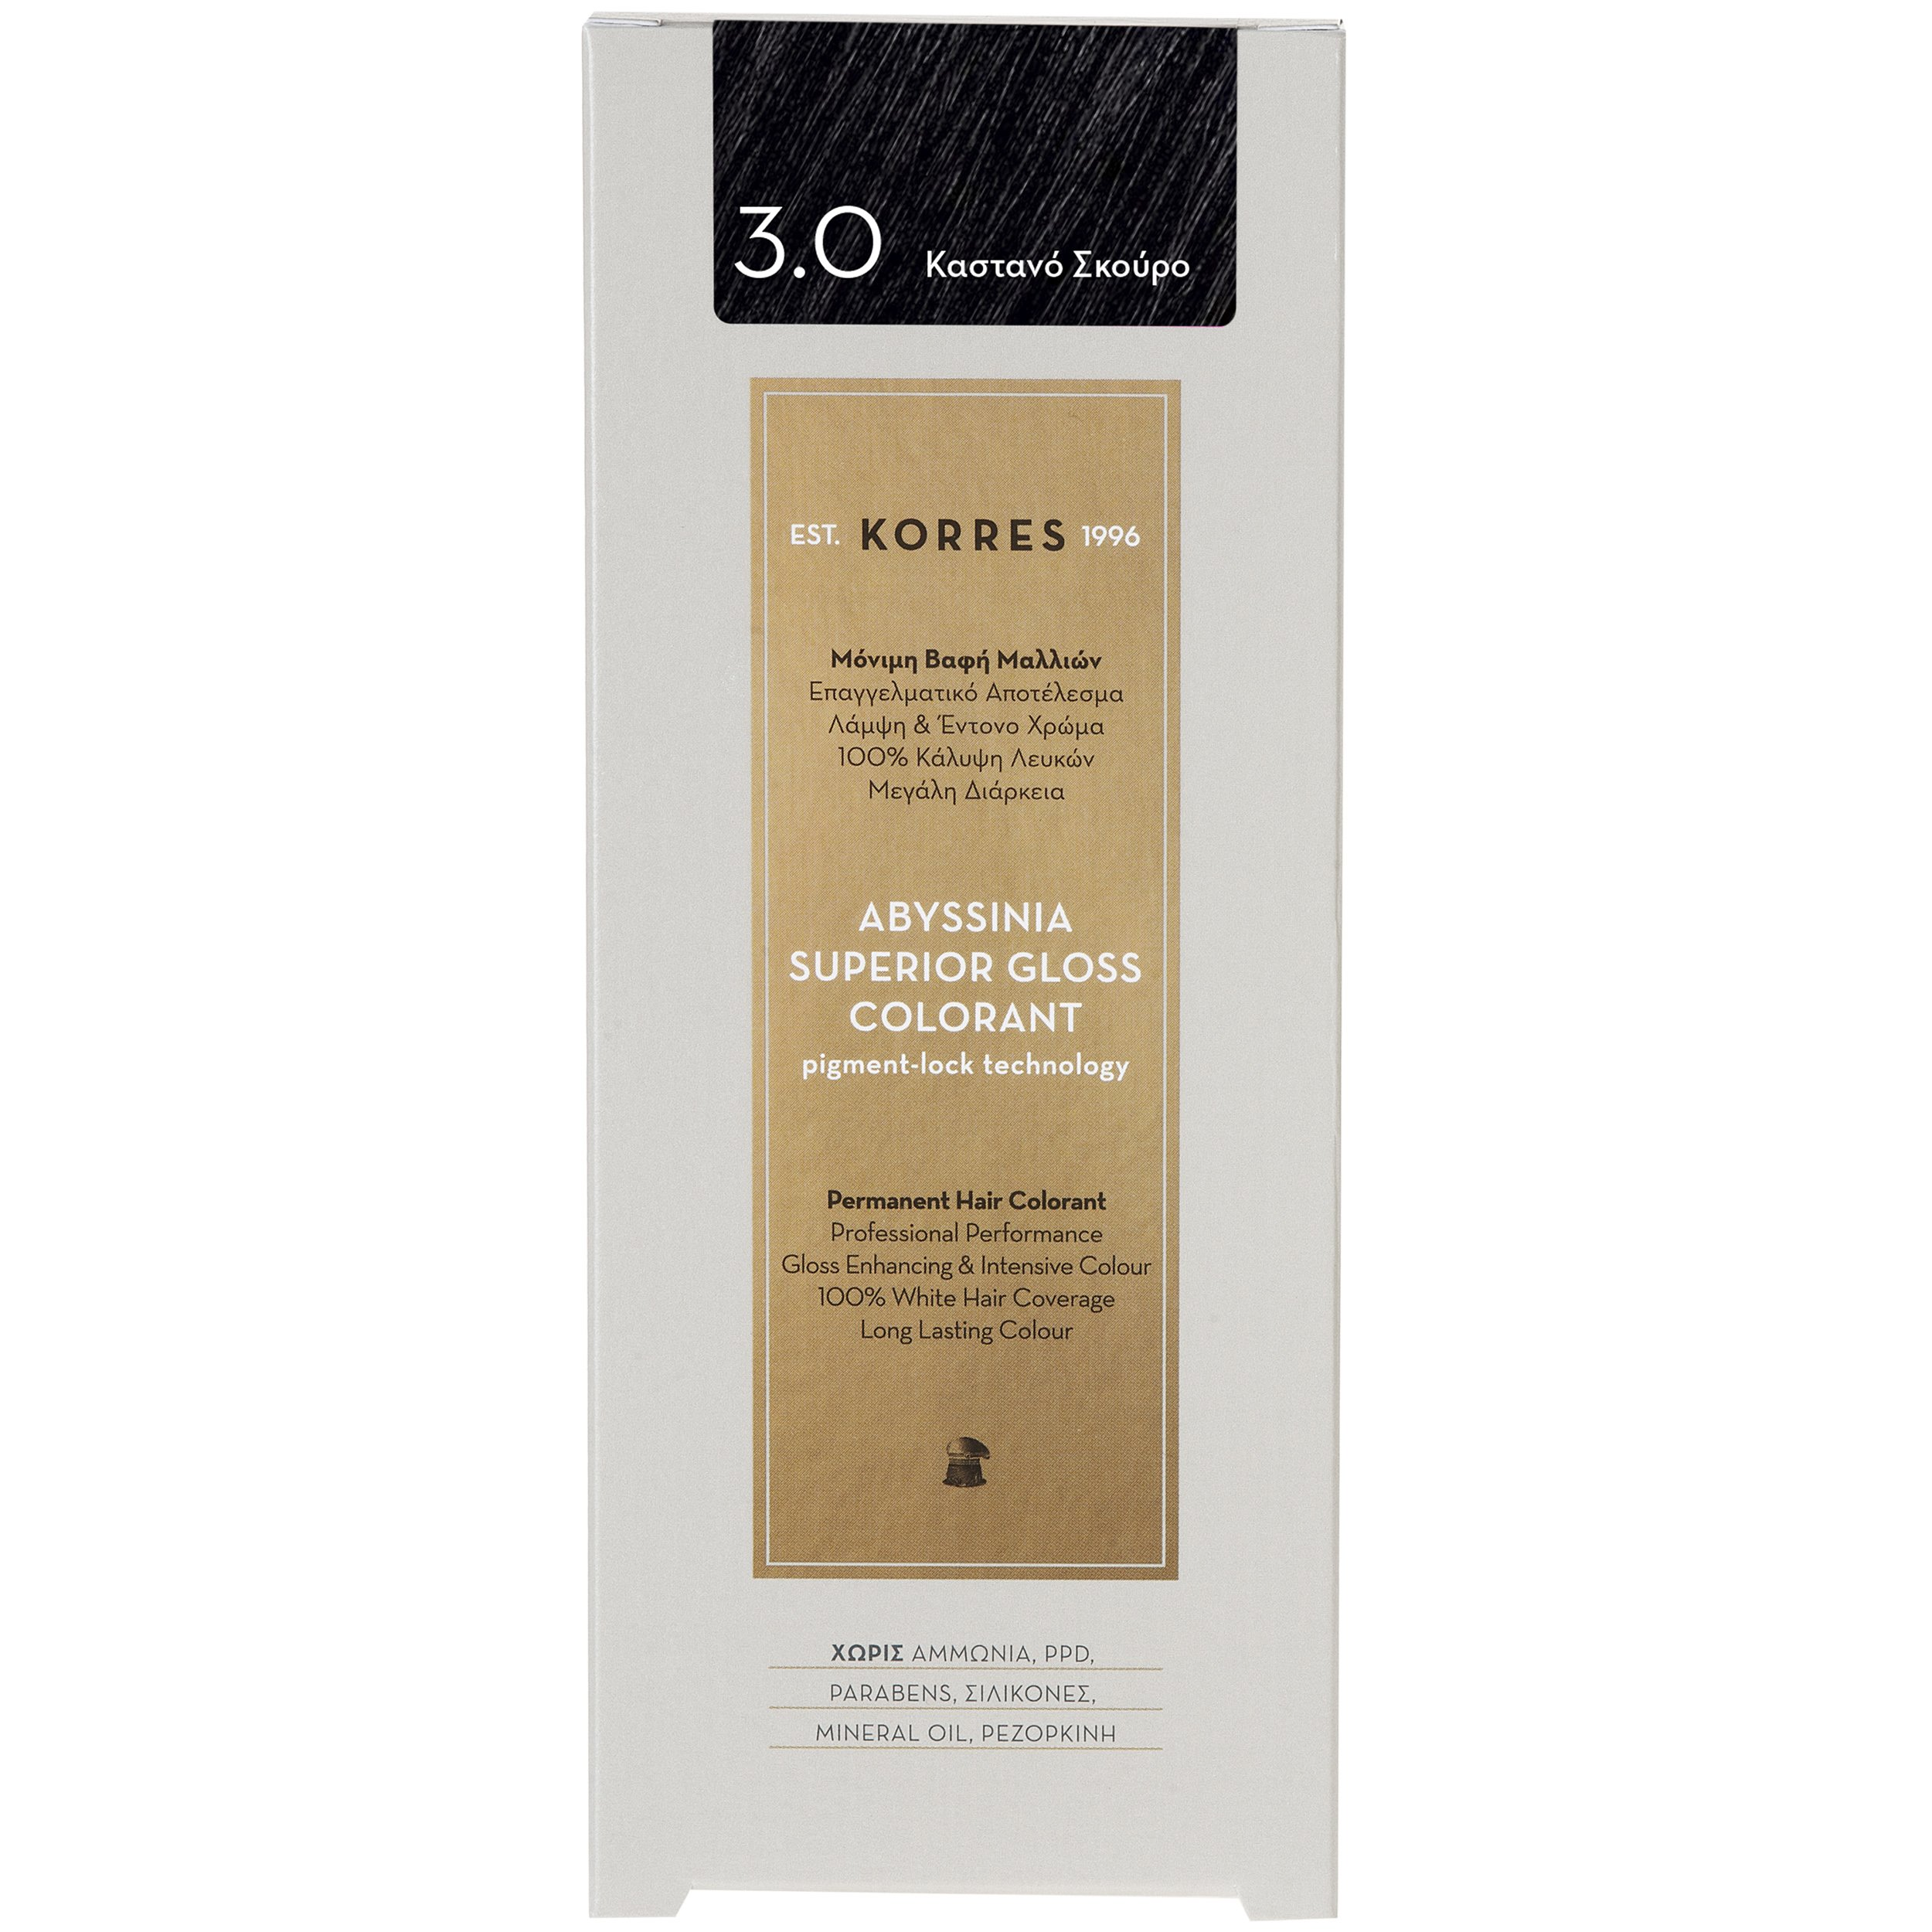 Korres Abyssinia Superior Gloss Colorant Επαγγελματικό Αποτέλεσμα Λάμψη & Έντονο Χρώμα – 3.0 ΚΑΣΤΑΝΟ ΣΚΟΥΡΟ